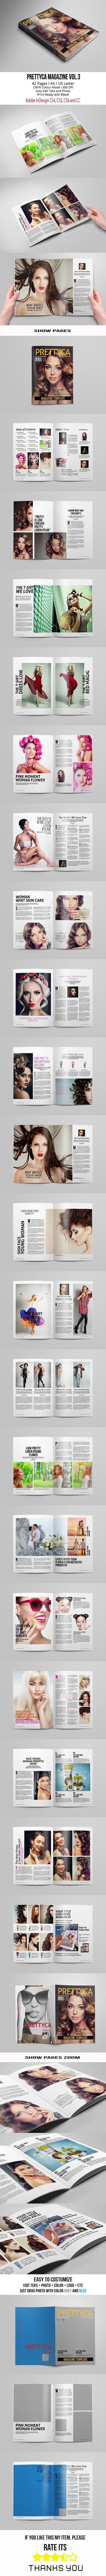 Indesign Jewelry Magazine Vol.3 A4/US Letter - $5 - Prettyca Magazine Vol.3 manis